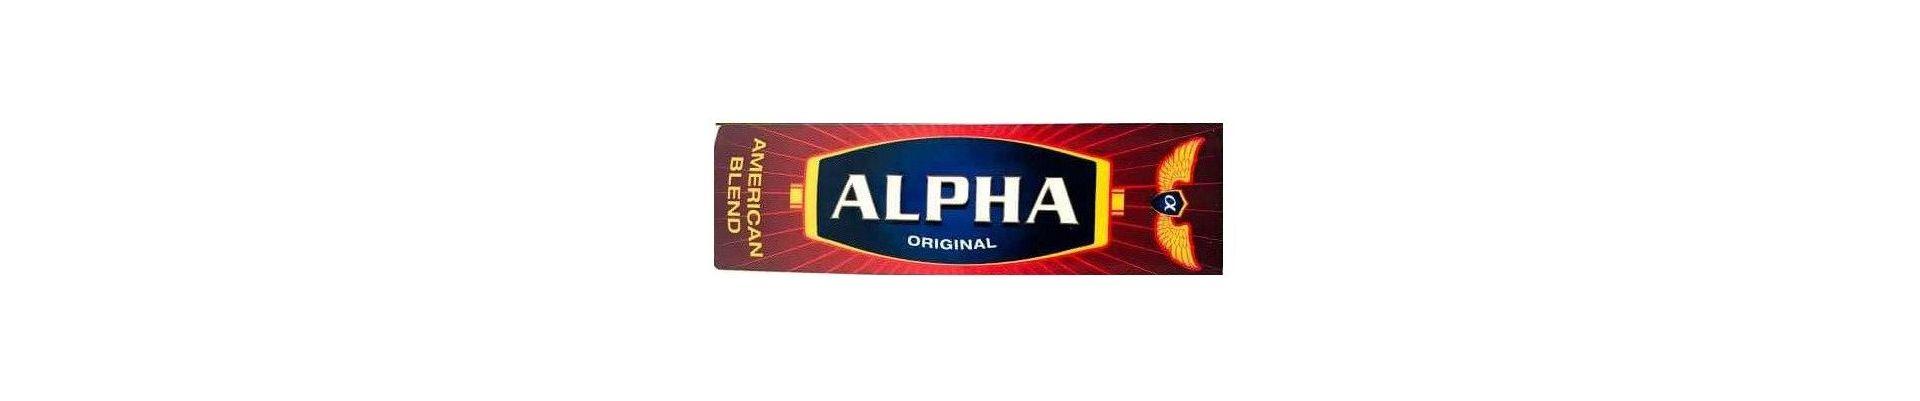 Tutun de injectat tigari Alpha de vanzare.Pret tutun de rulat Alpha